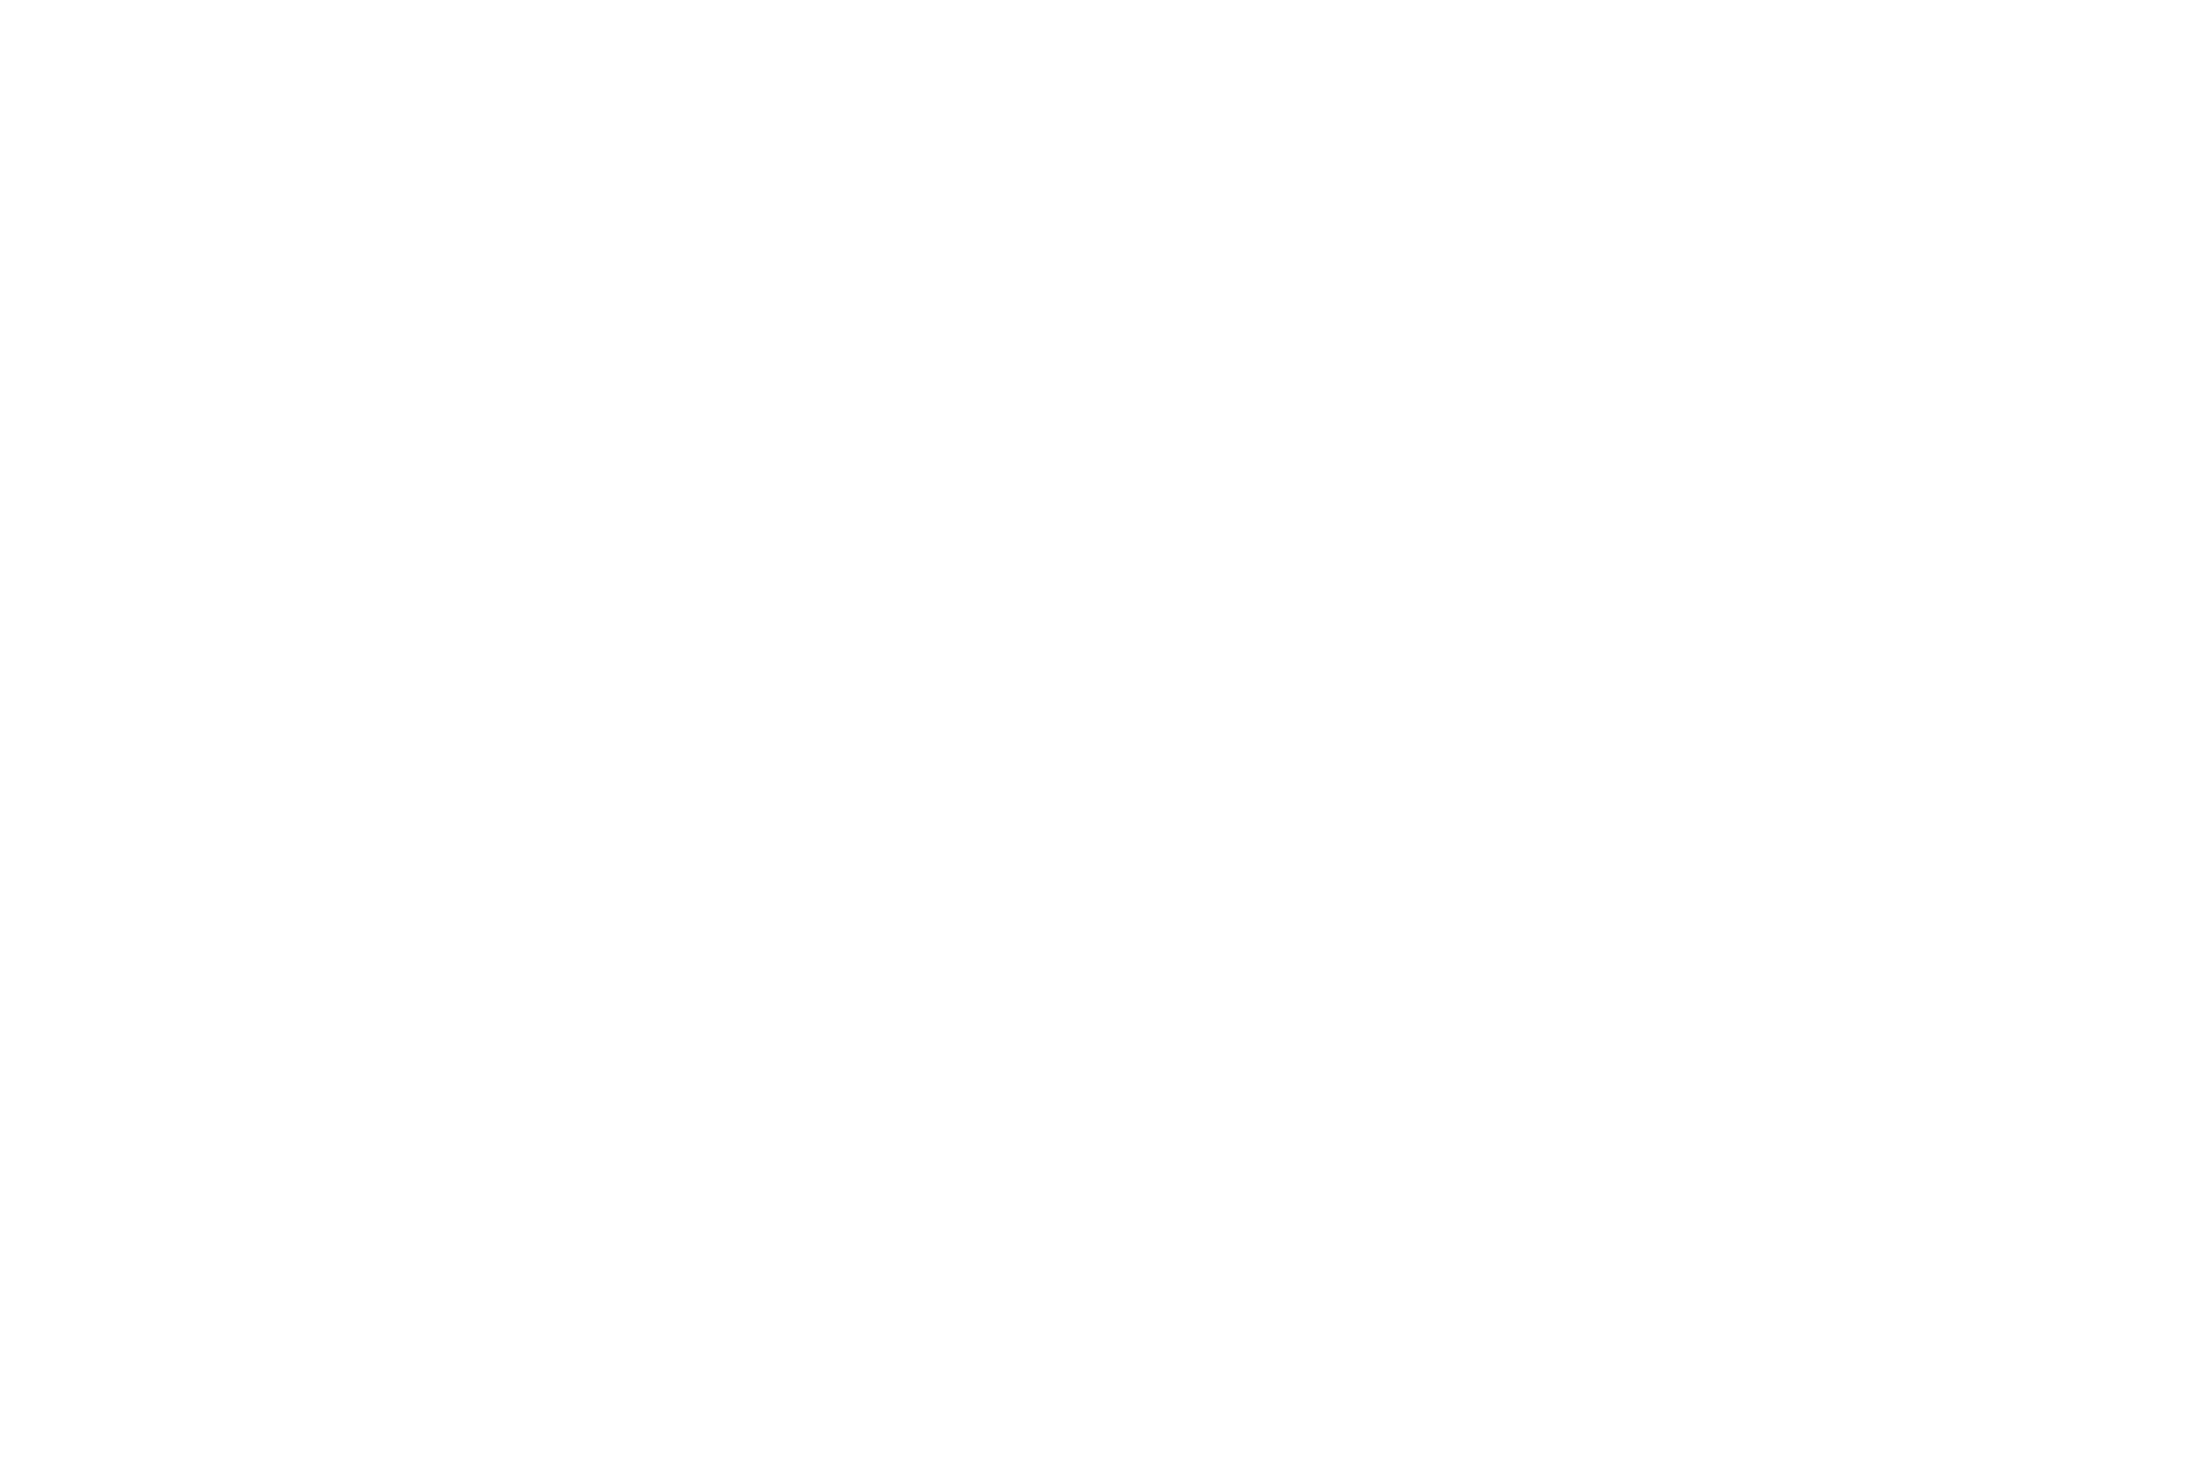 Logo Lvz